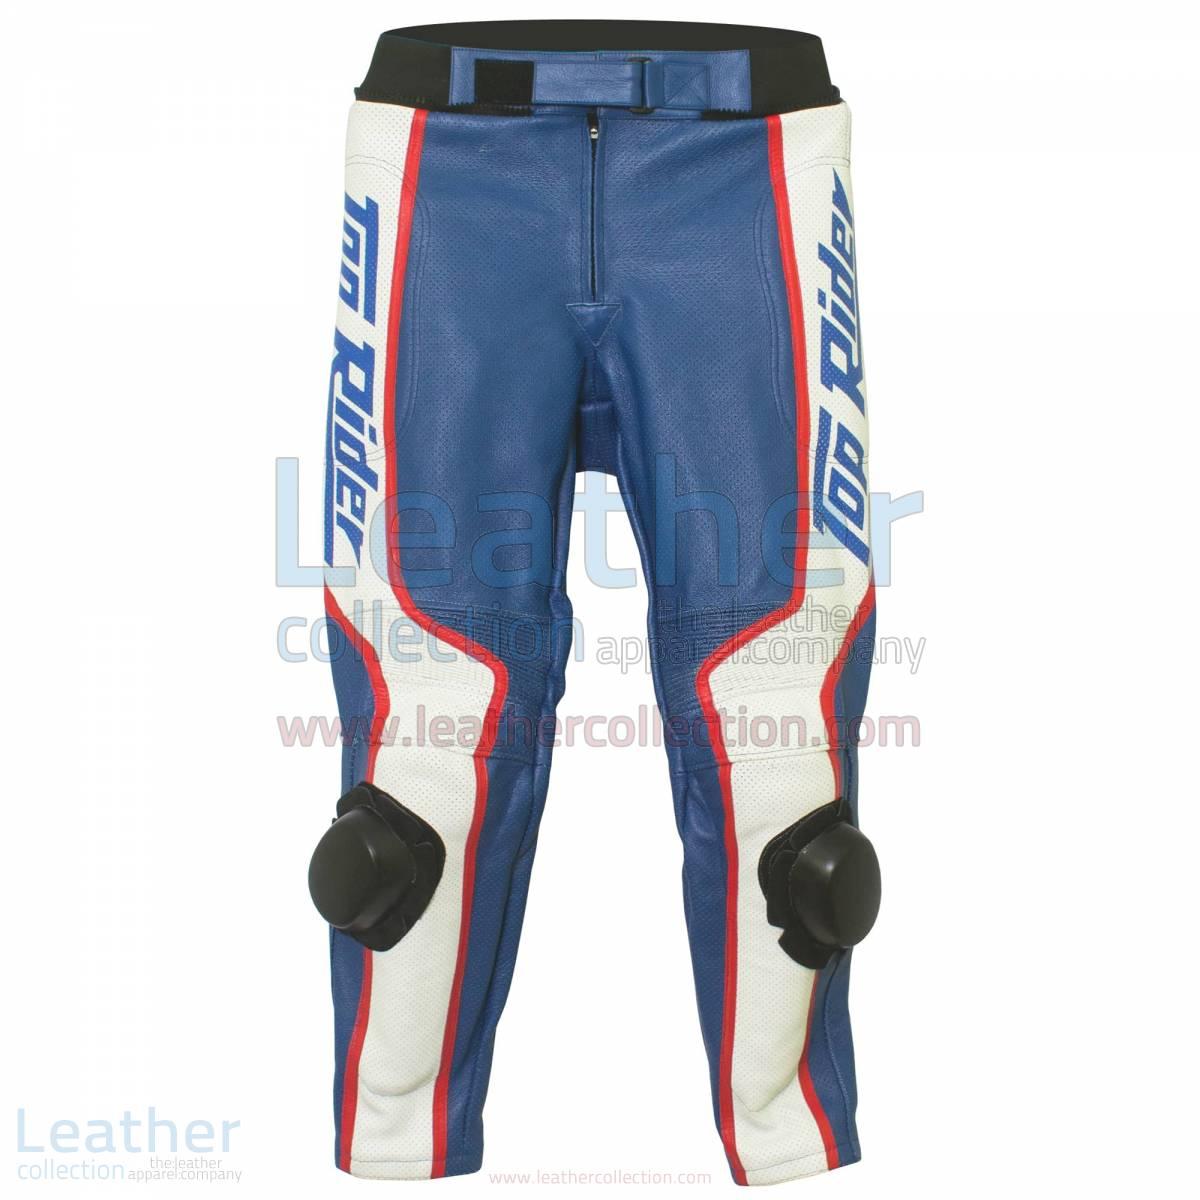 Freddie Spencer Honda Daytona 1985 Motorcycle Racing Pant